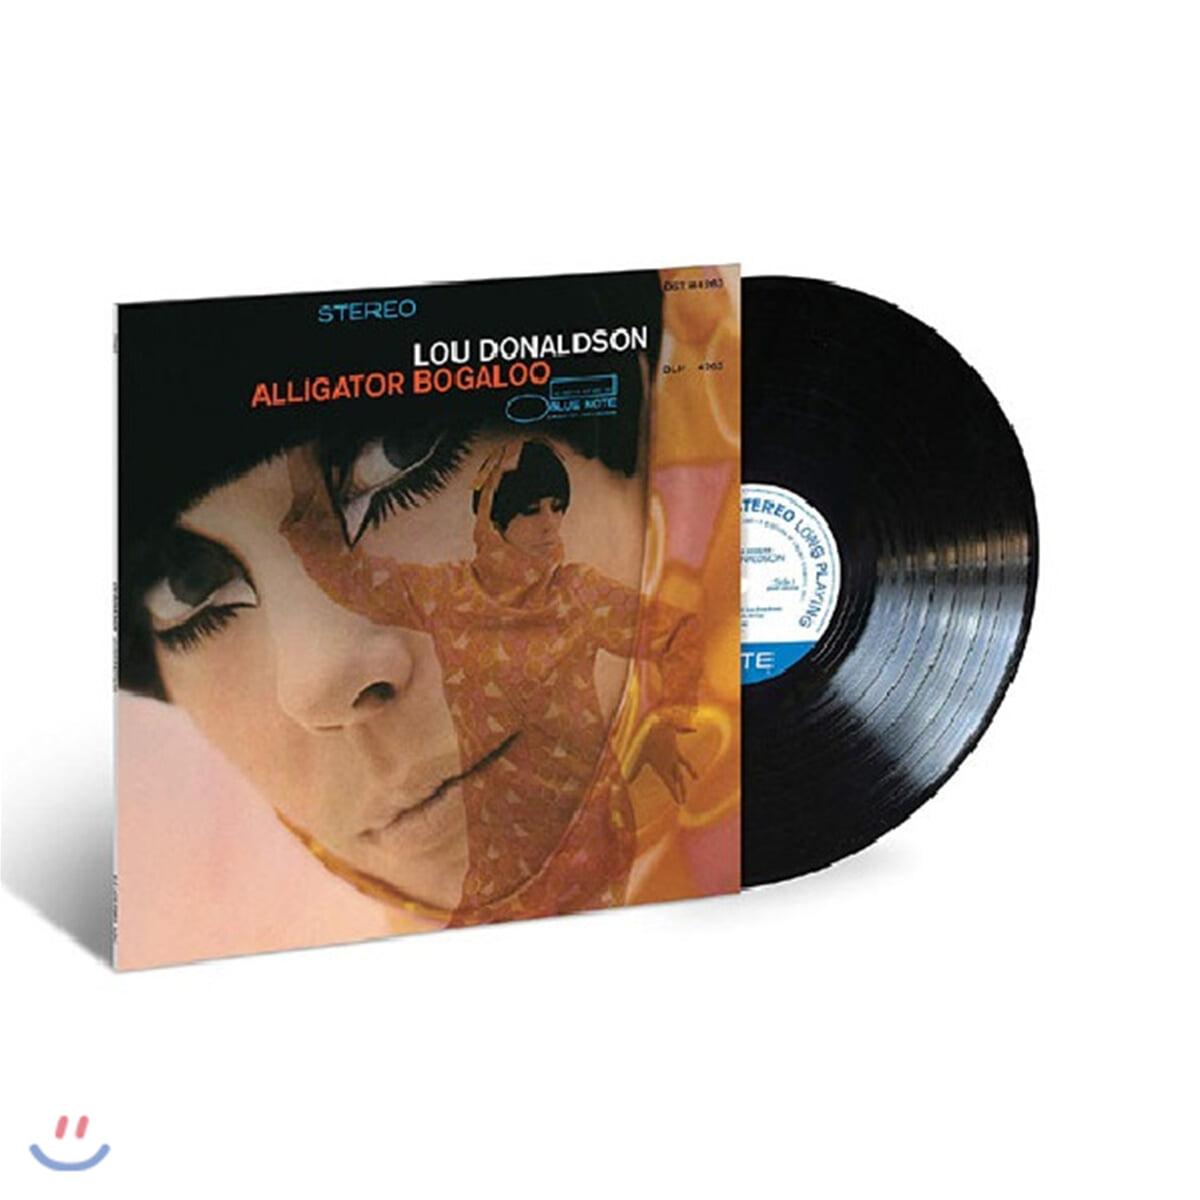 Lou Donaldson (루 도날슨) - Alligator Bogaloo [LP]